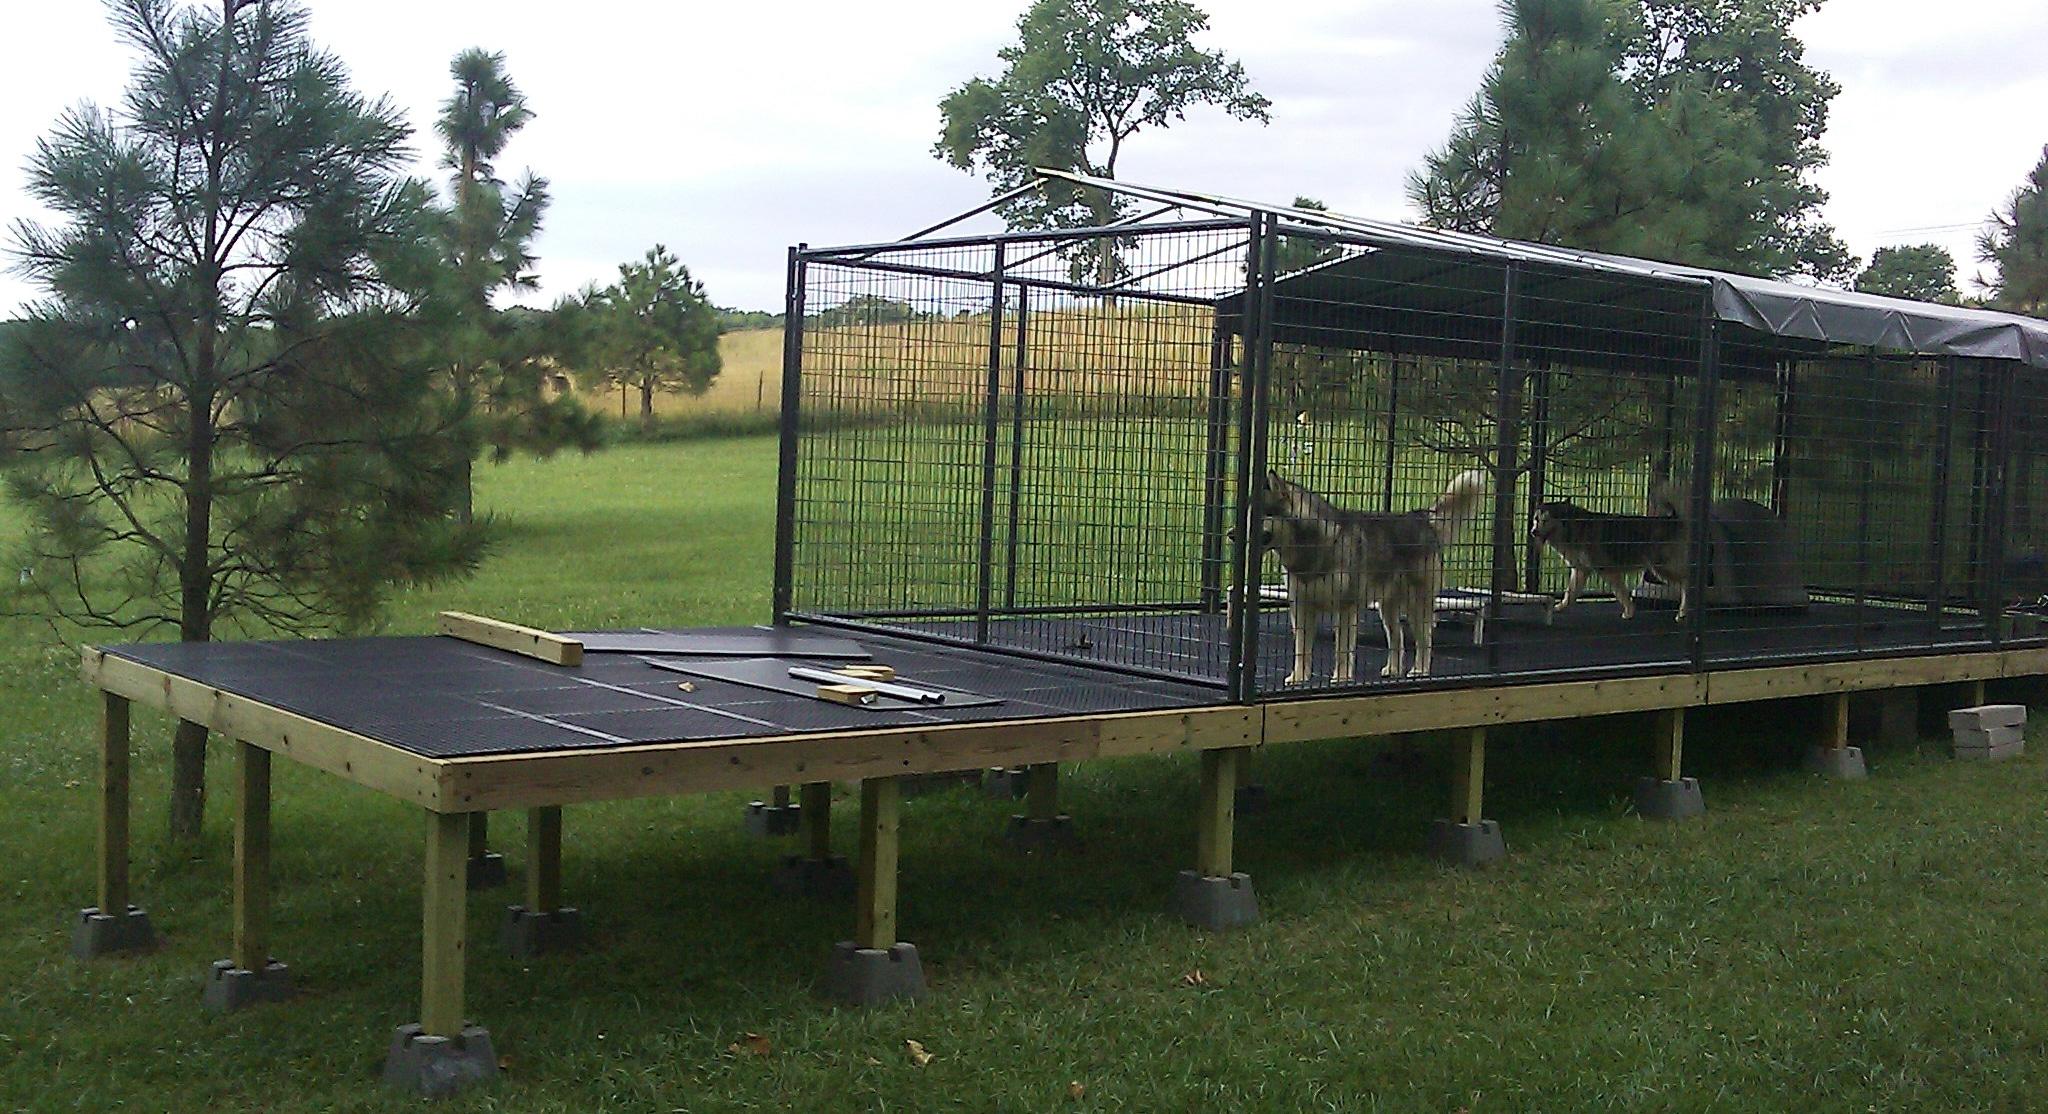 Husky Dogs on Dog Kennel Flooring